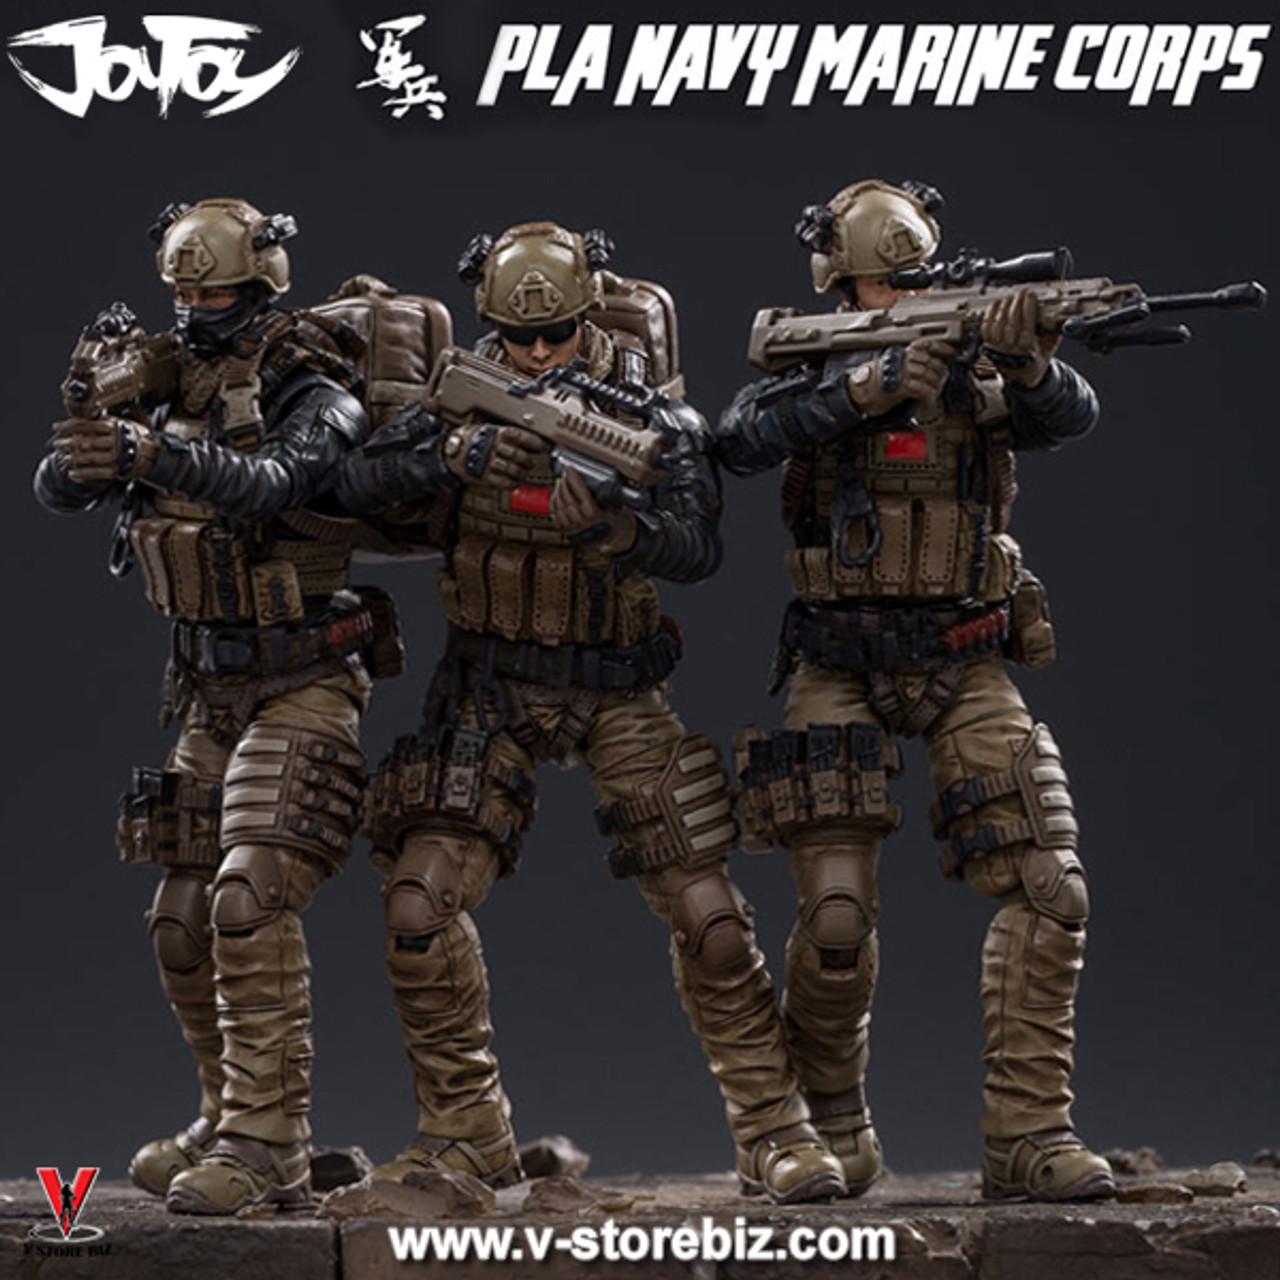 JoyToy 1//18 PLA Navy Marine Corps External Combat Team Action Figure In Stock!!!